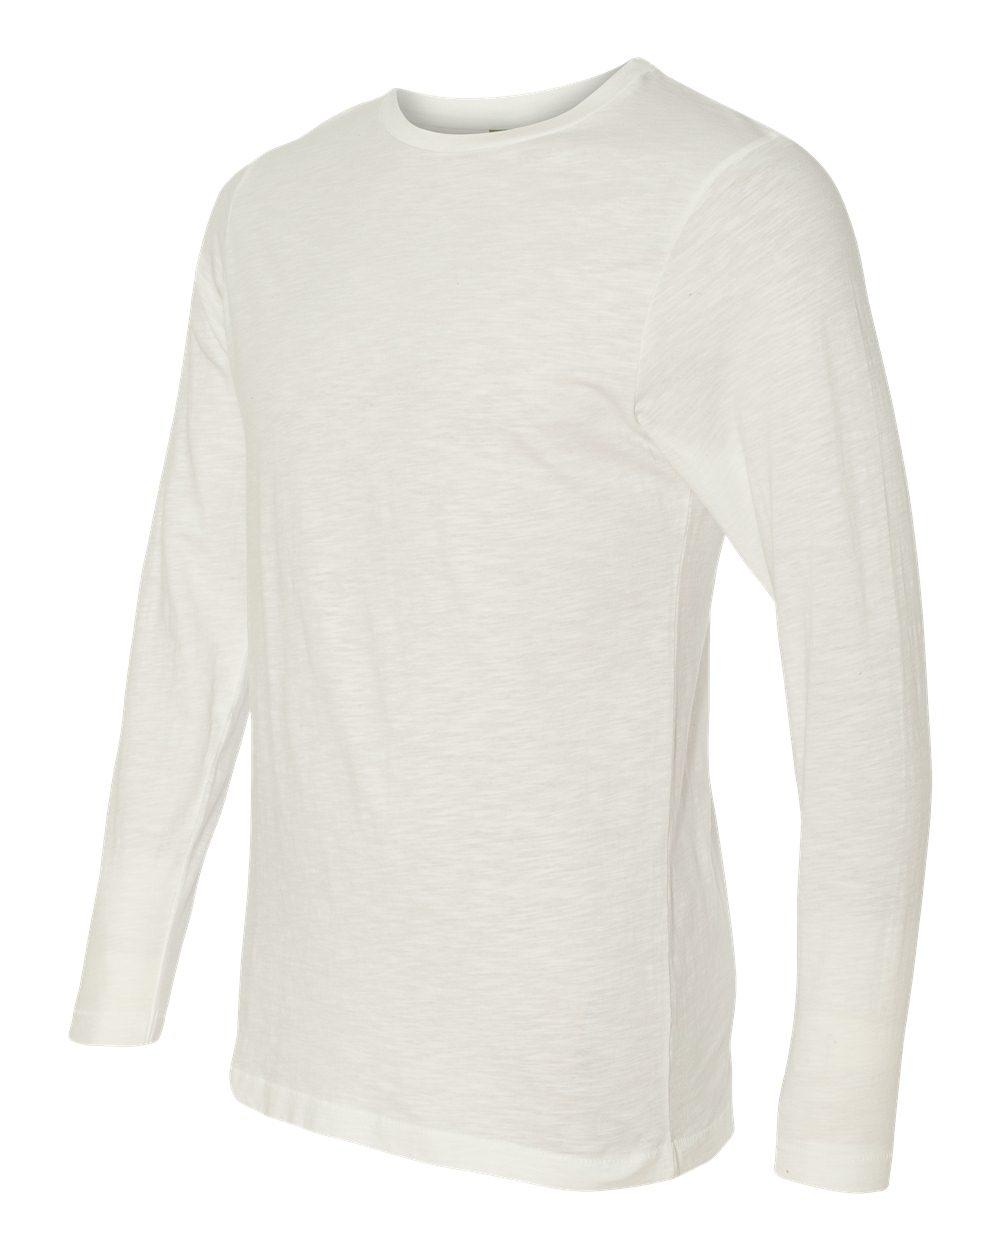 Alternative 4847 - Joey Unisex Slub Long Sleeve Crewneck T-Shirt